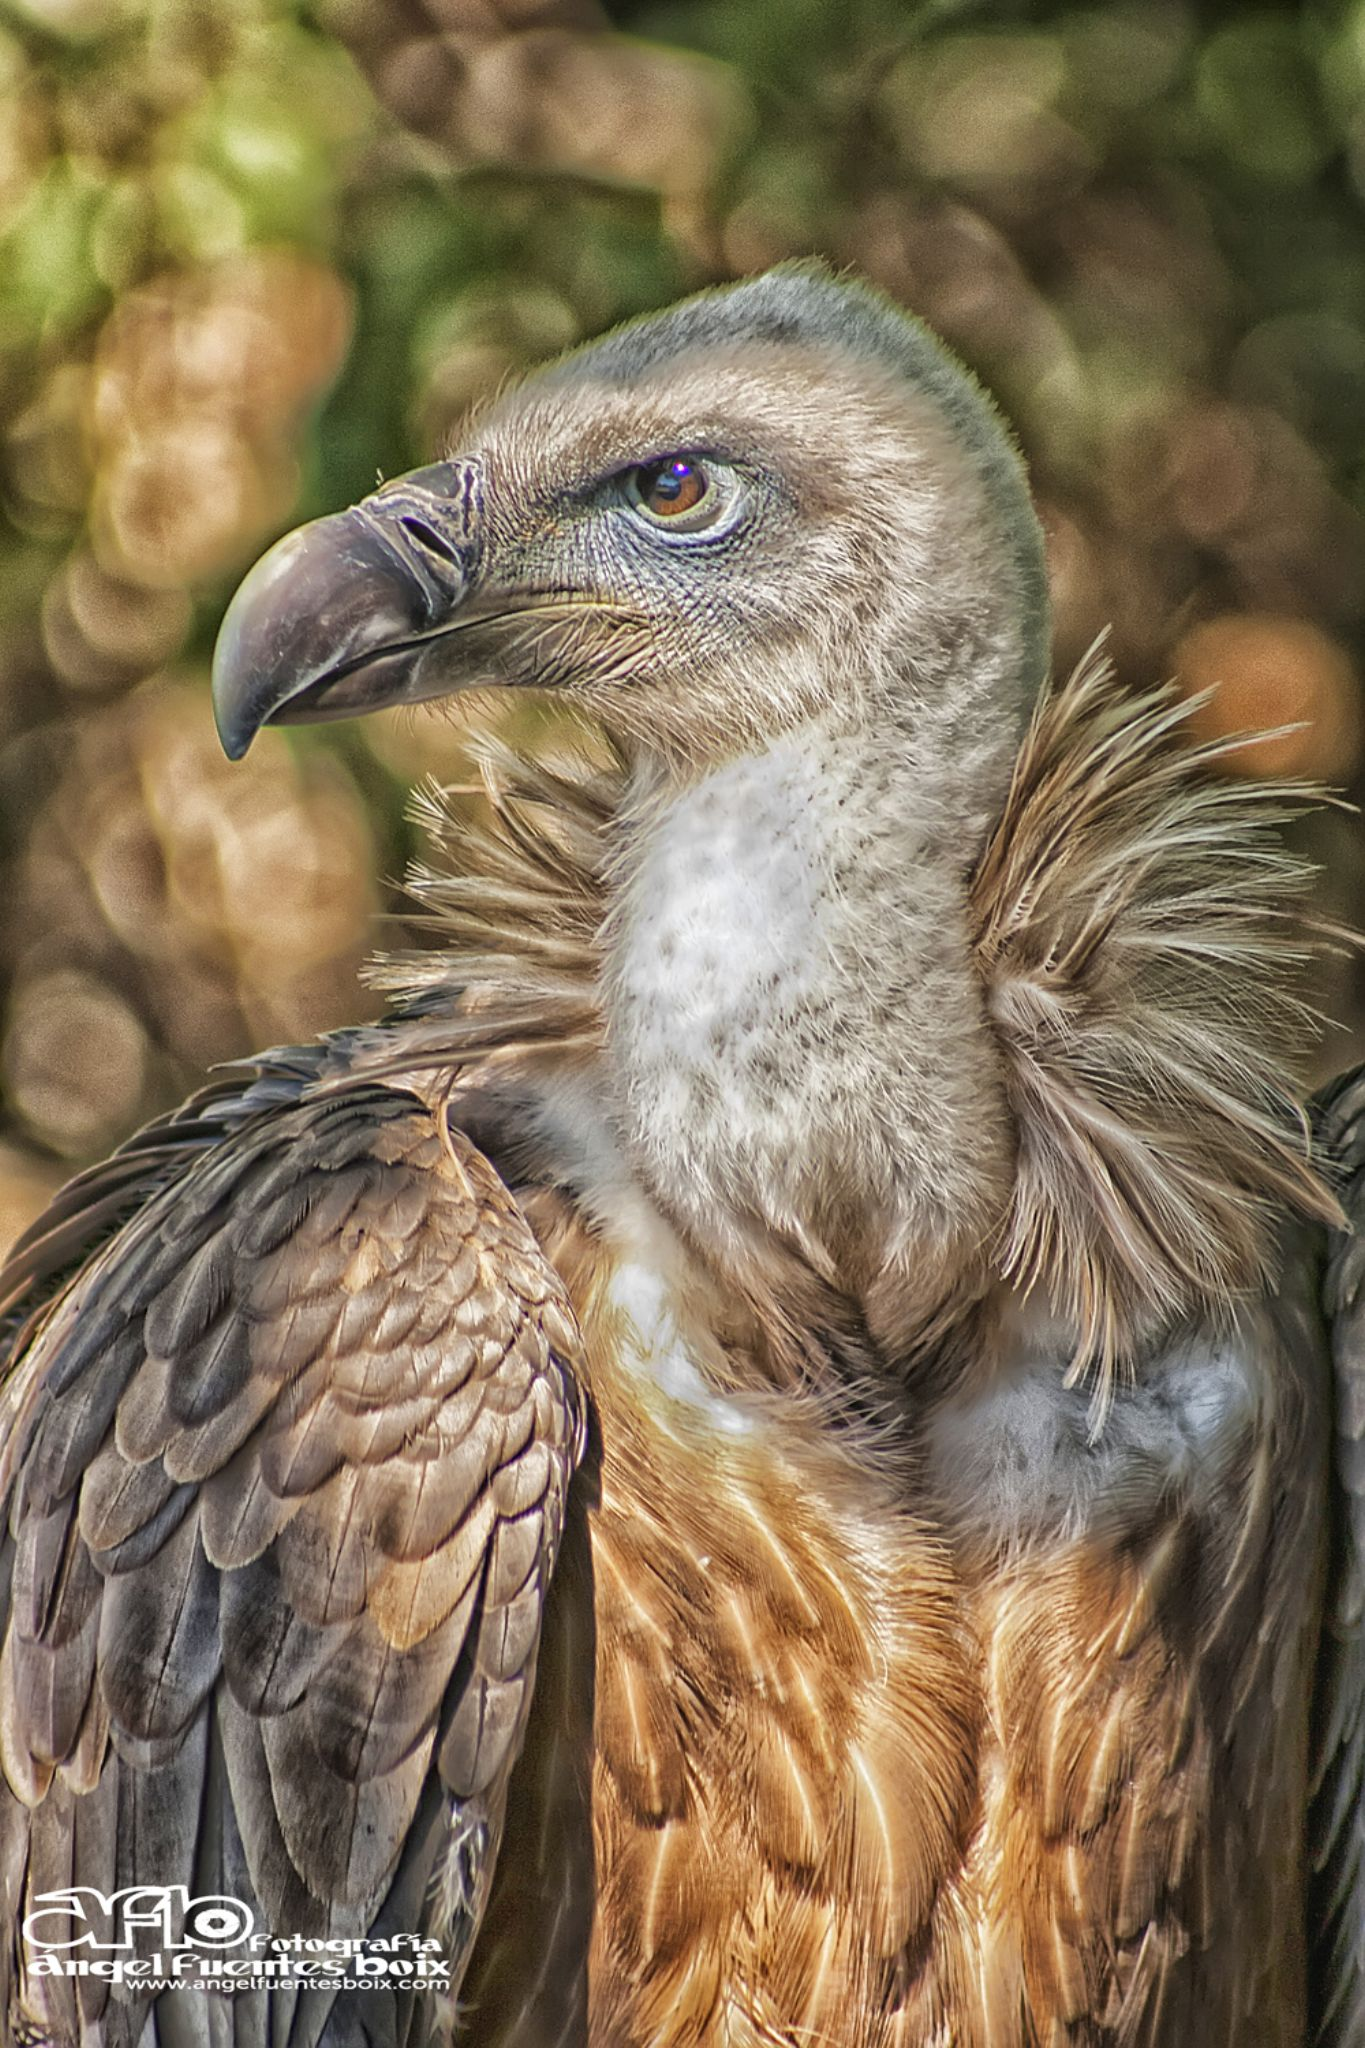 Tierna mirada by angel.fuentesboixFotografia